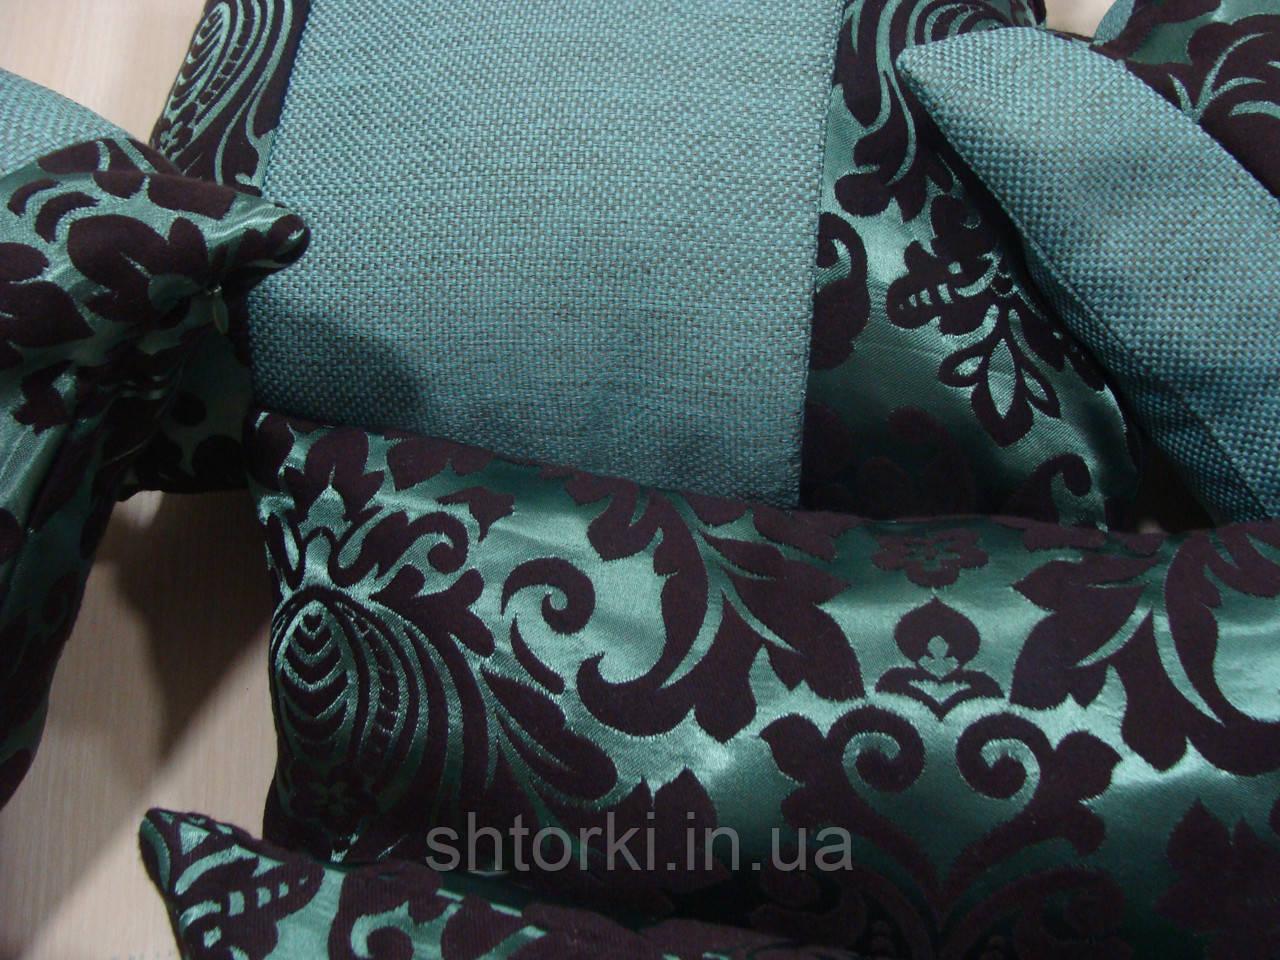 Комплект подушек  бирюза коронка, 5шт